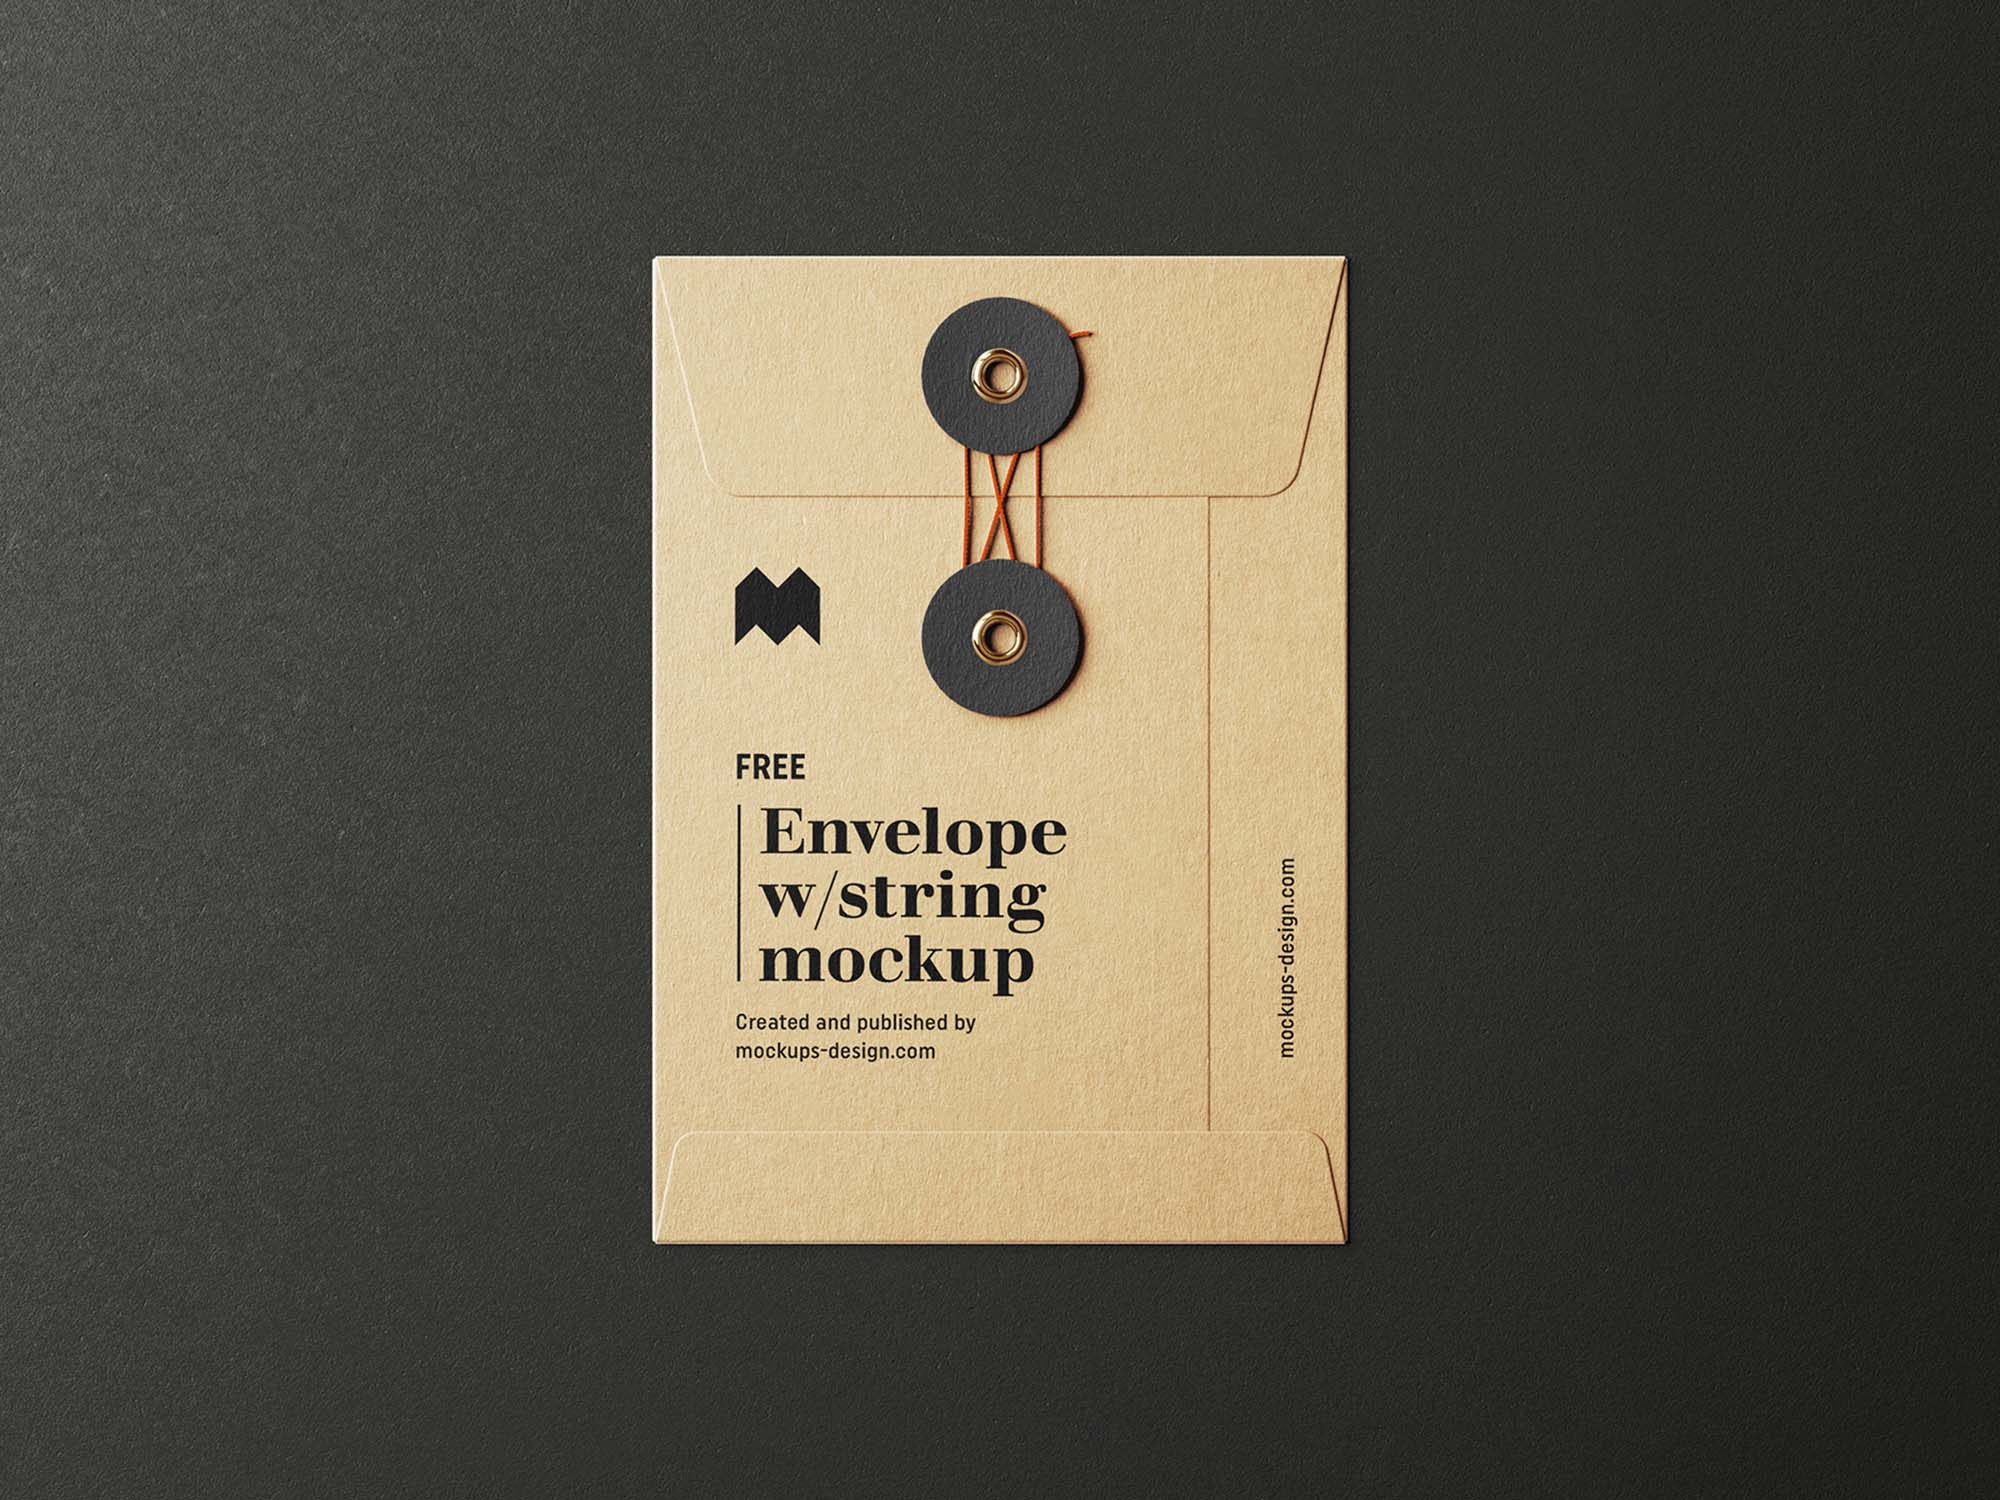 C6 Envelope with String Mockup 3